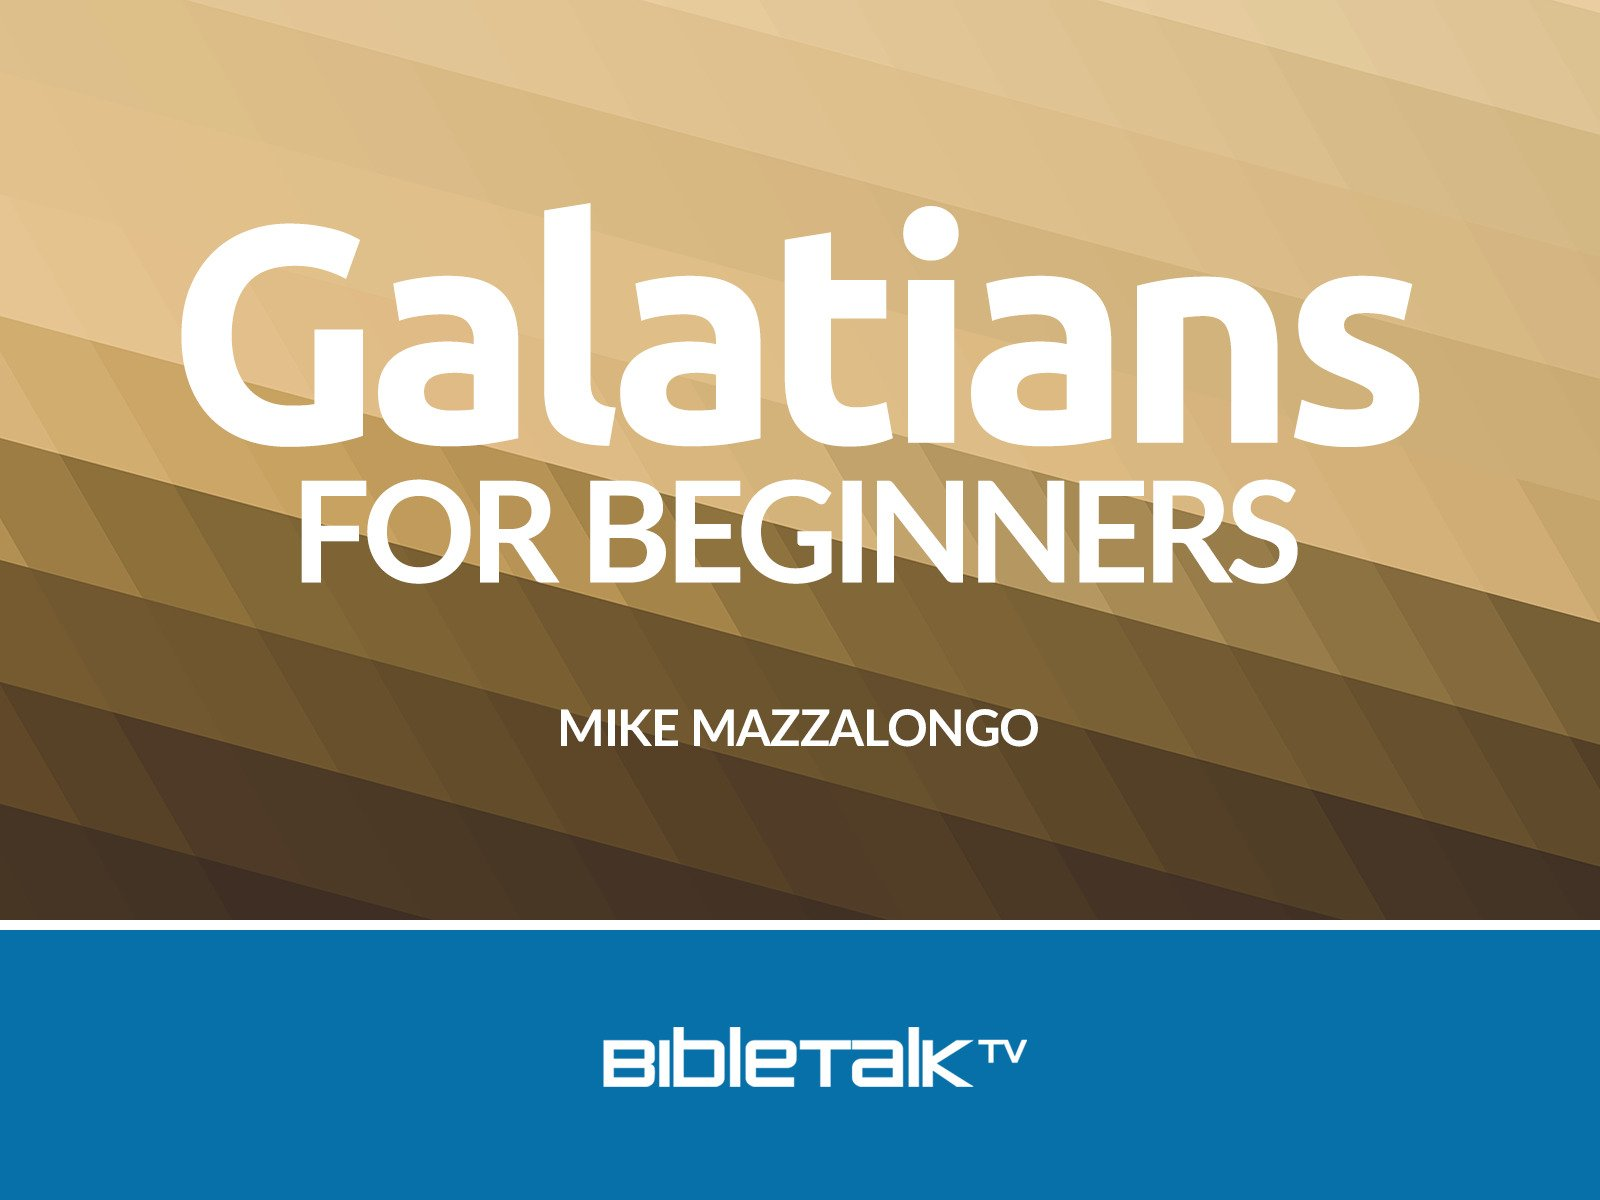 Galatians for Beginners